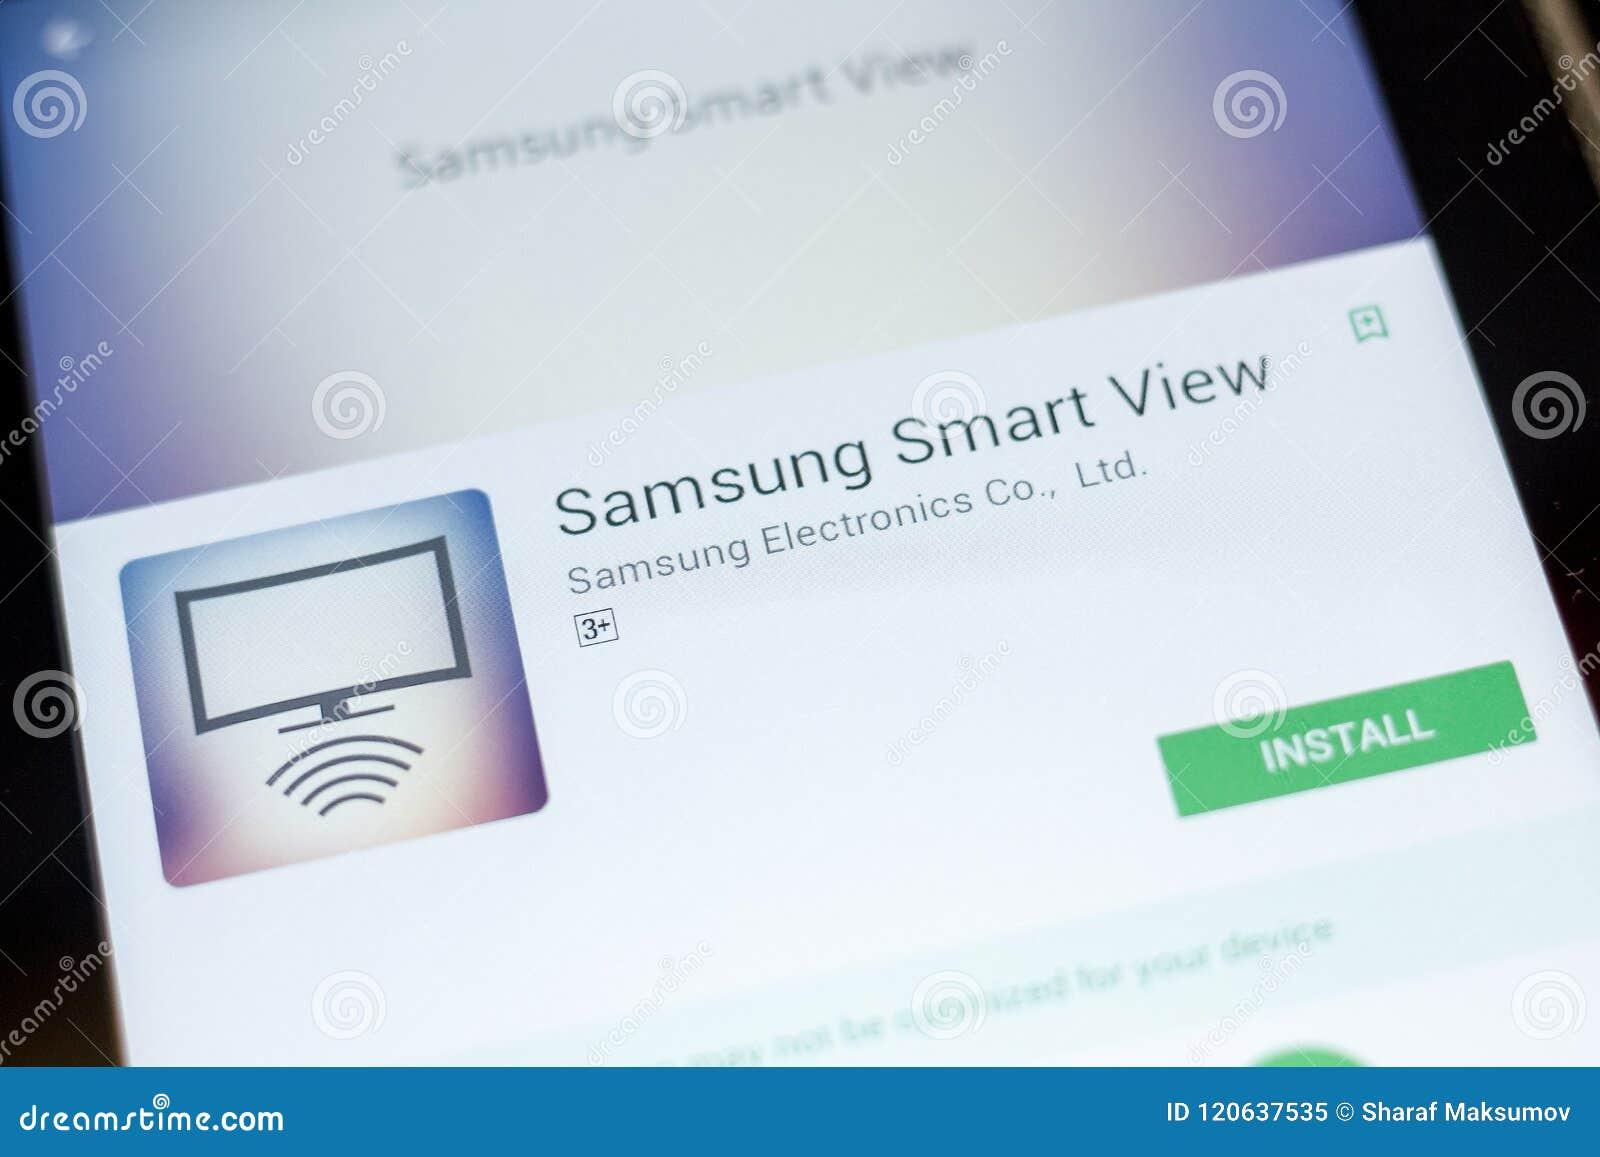 Ryazan, Russia - July 03, 2018: Samsung Smart View Mobile